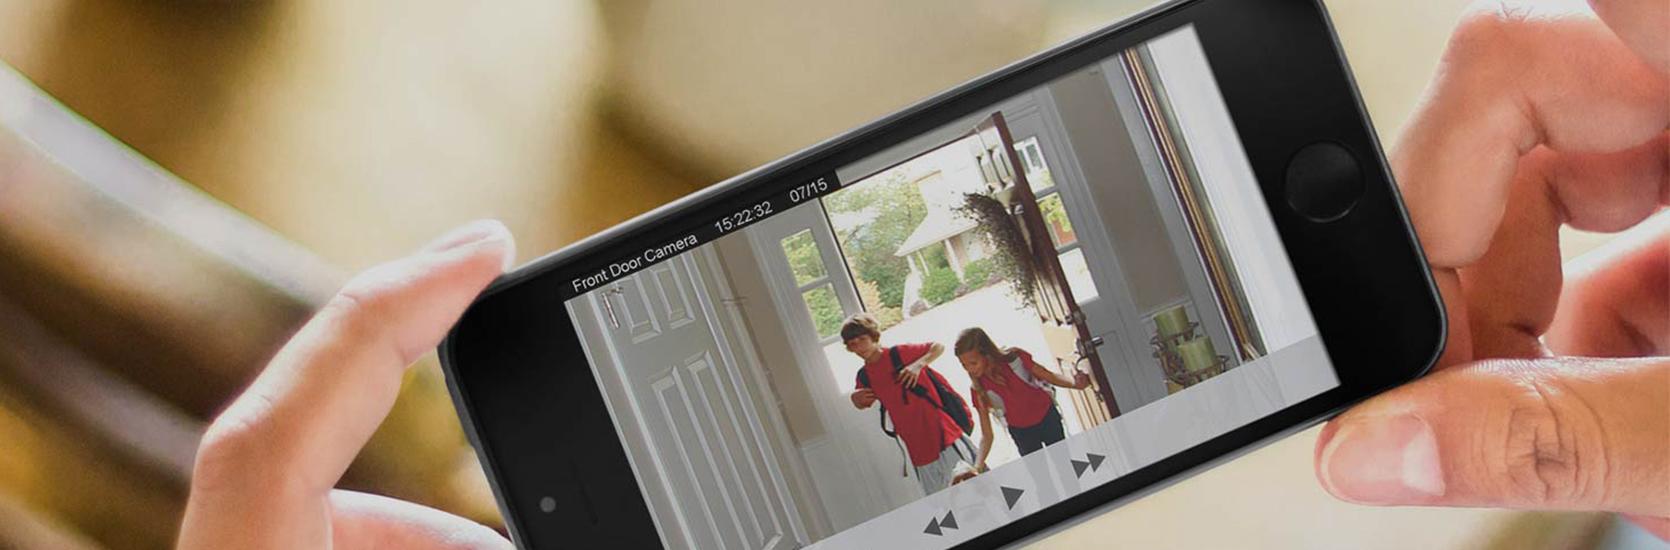 Interfoane / Videointerfoane Vaslui